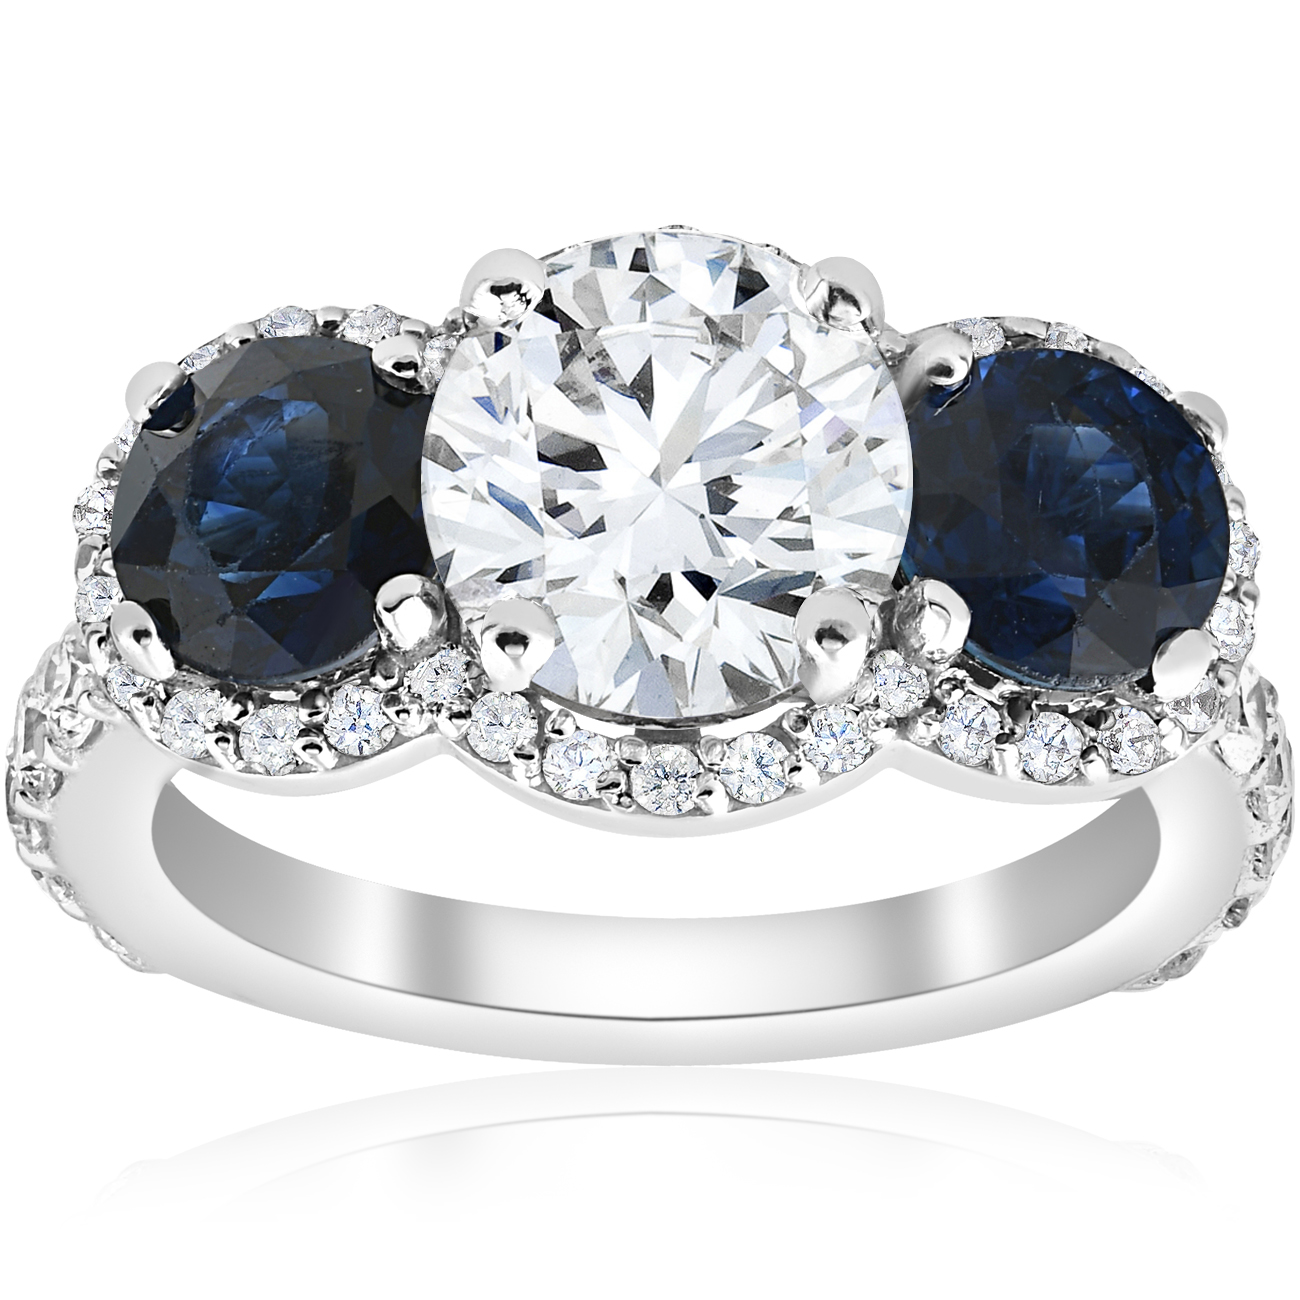 3 1 2 ct genuine sapphire diamond halo 3 stone. Black Bedroom Furniture Sets. Home Design Ideas